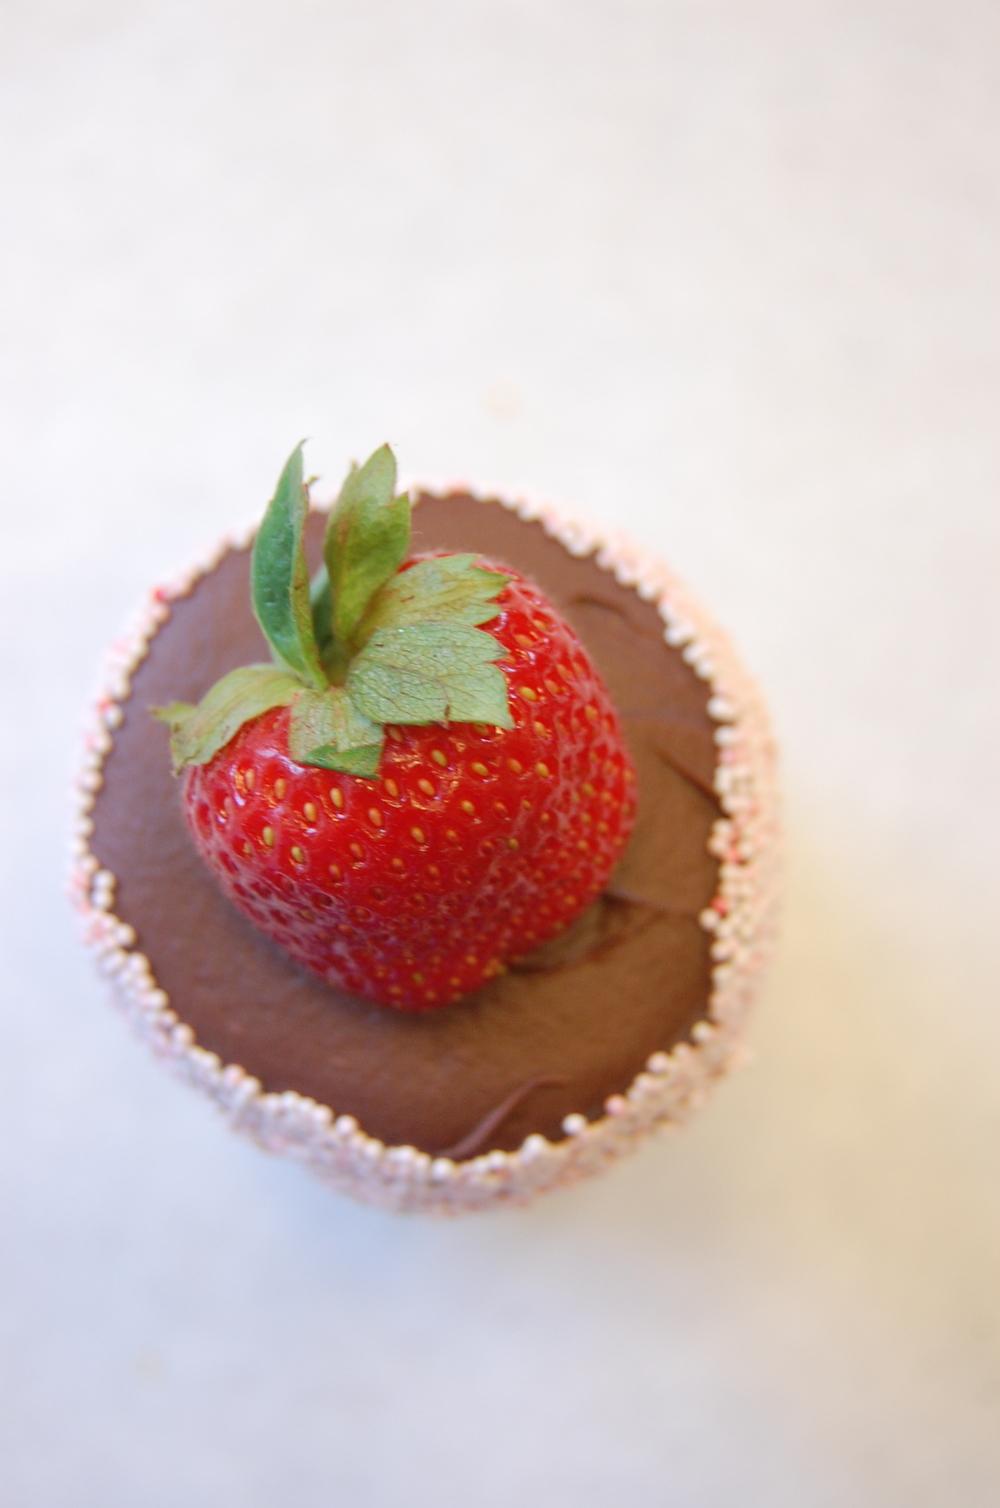 2016 strawberry choc strawberry.jpg